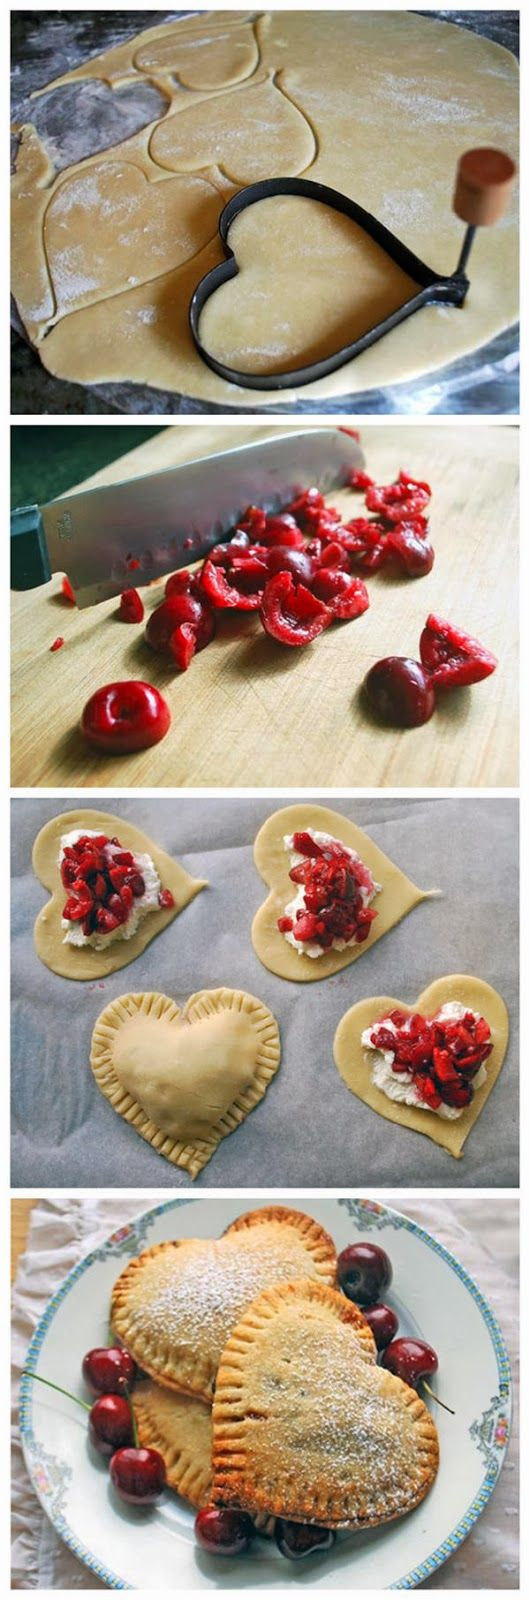 Red Star Recipe: Sweetheart Cherry Pies